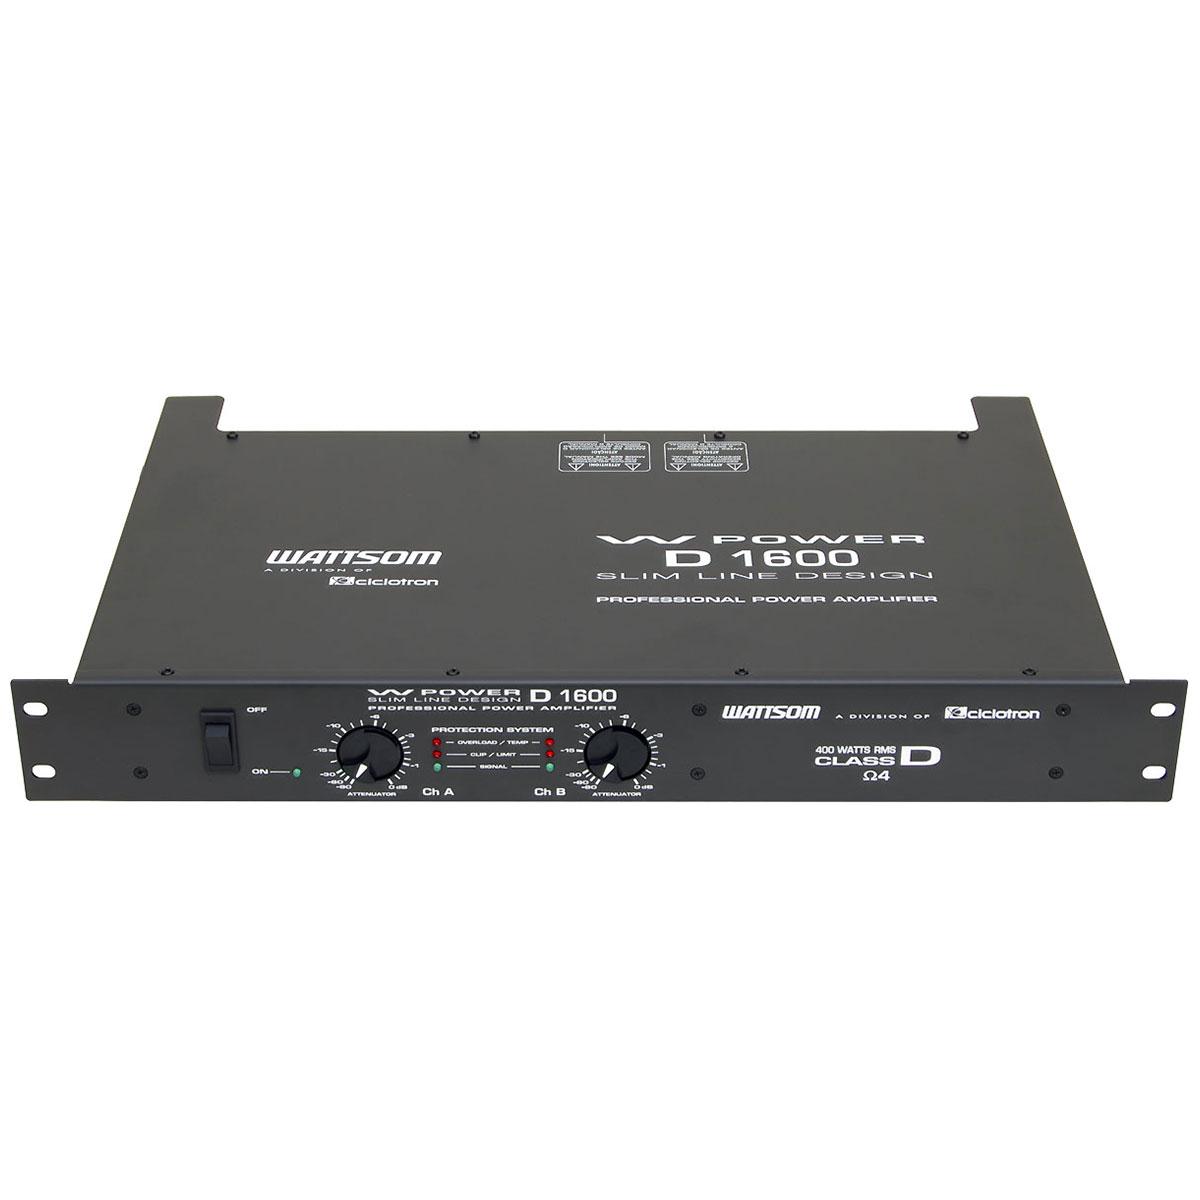 Amplificador Estéreo 2 Canais 400W ( Total ) W Power D 1600 - Ciclotron